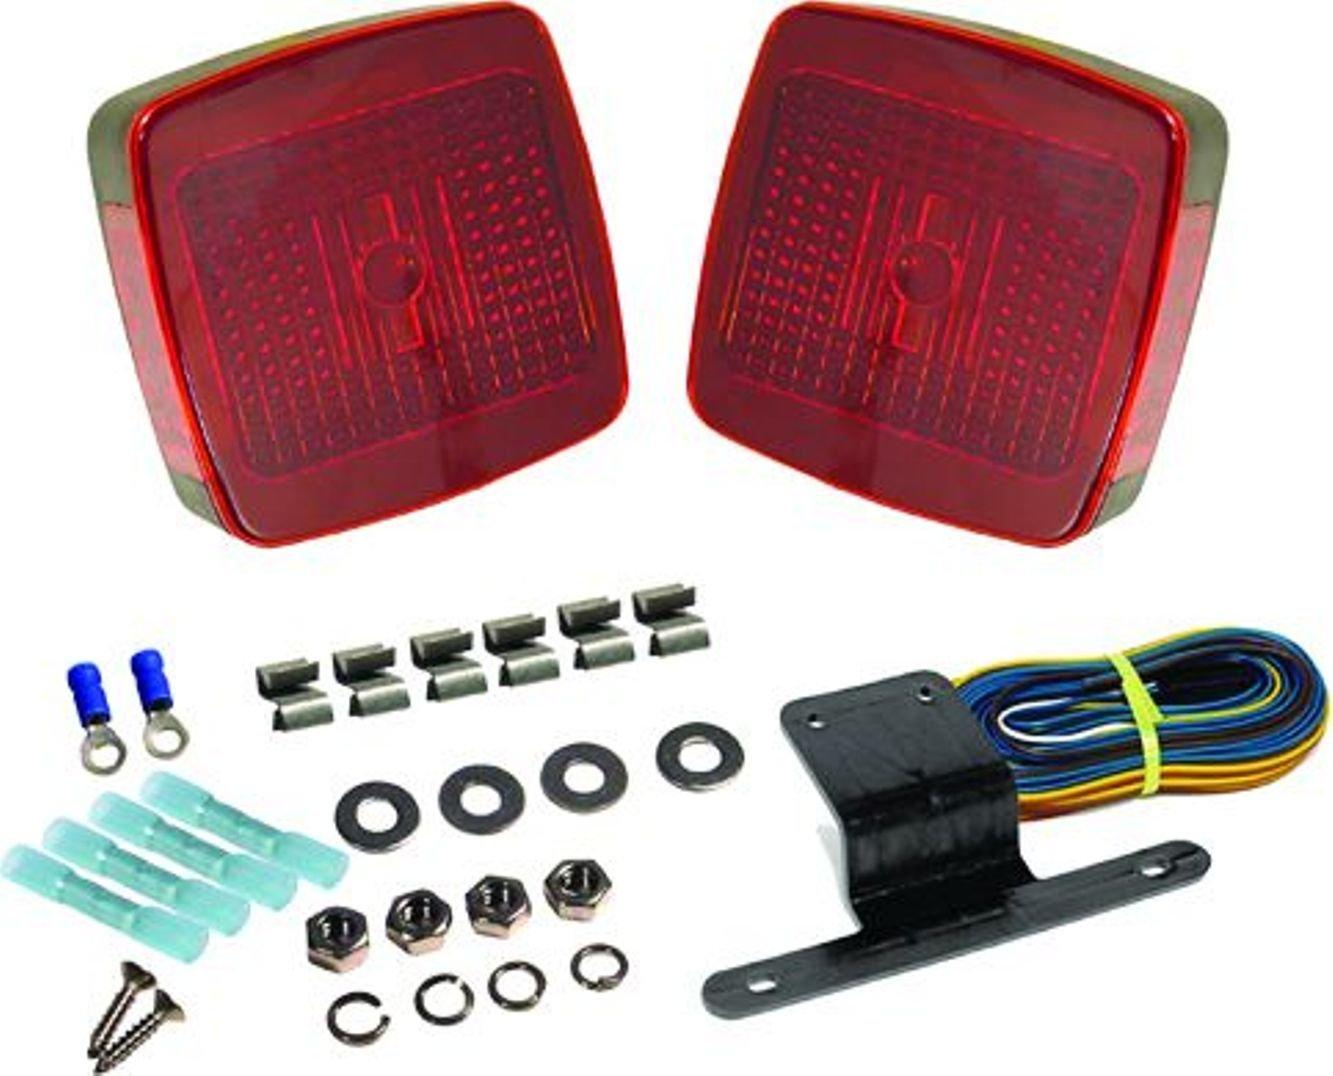 Seasense Square Led Trailer Tail Light Kit Automotive W 2539 Wiring Harness Optronics Lights